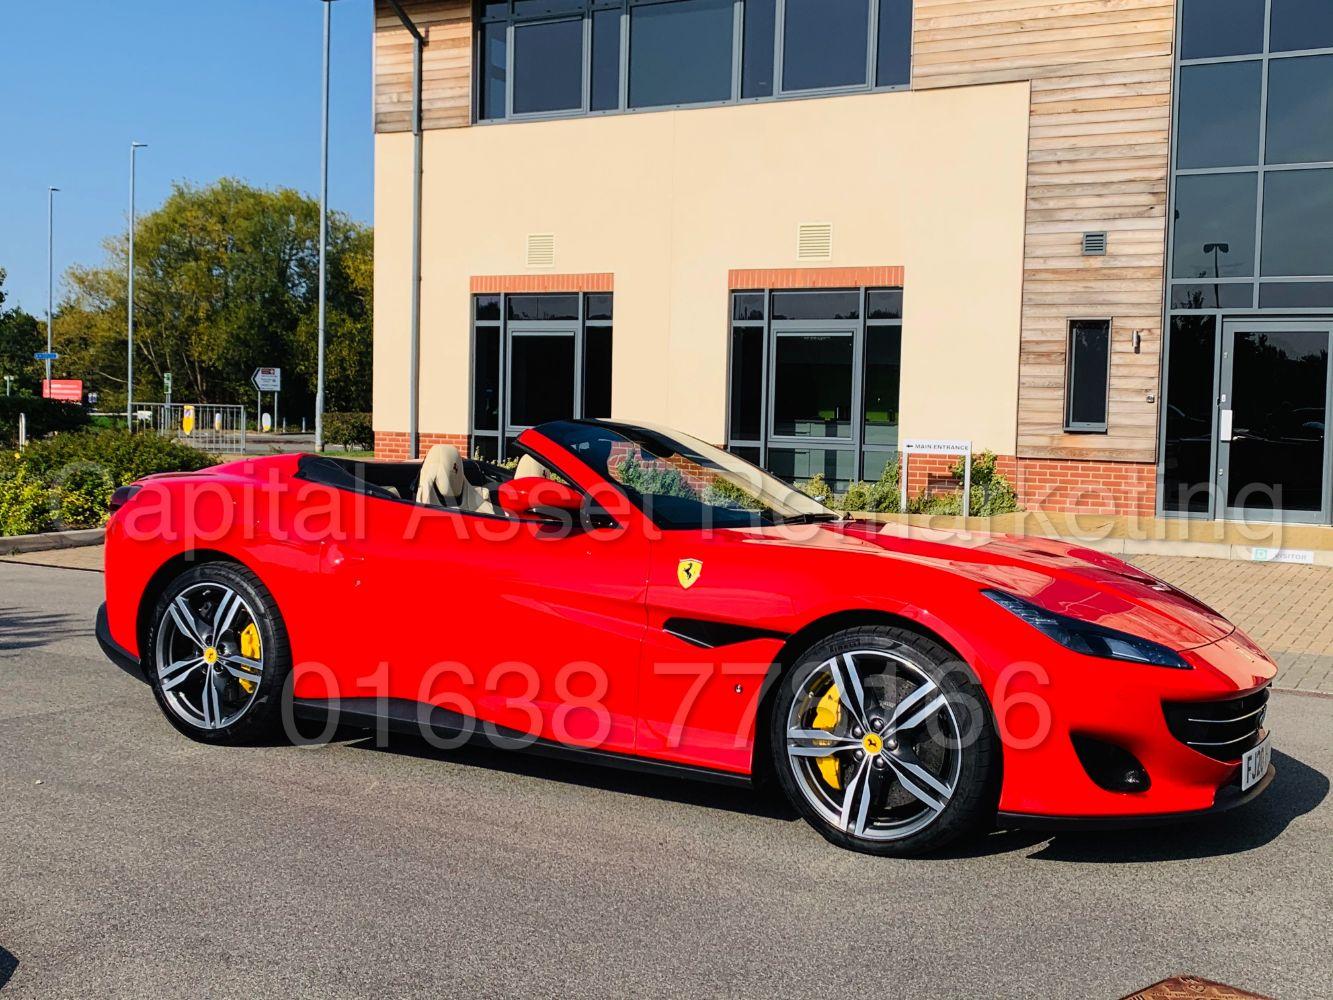 2020 Ferrari Portofino 3.9T V8 *Convertible* - 2020 (Brand New) Rolex SkyDweller 42mm - 2020 (Brand New) Rolex GMT Master II *Root Beer* + More!